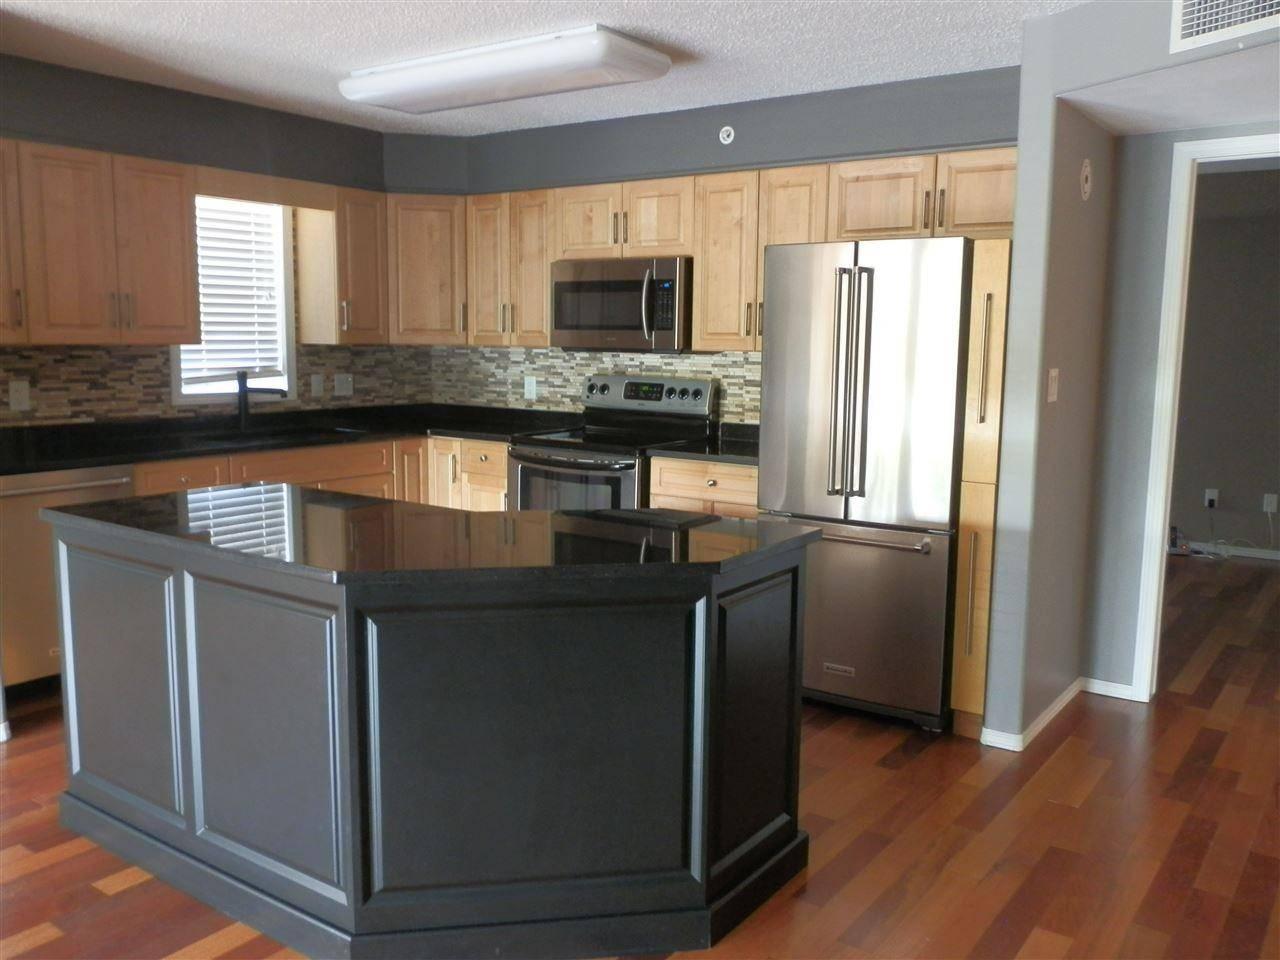 306 - 1605 7 Avenue, Cold Lake | Image 2